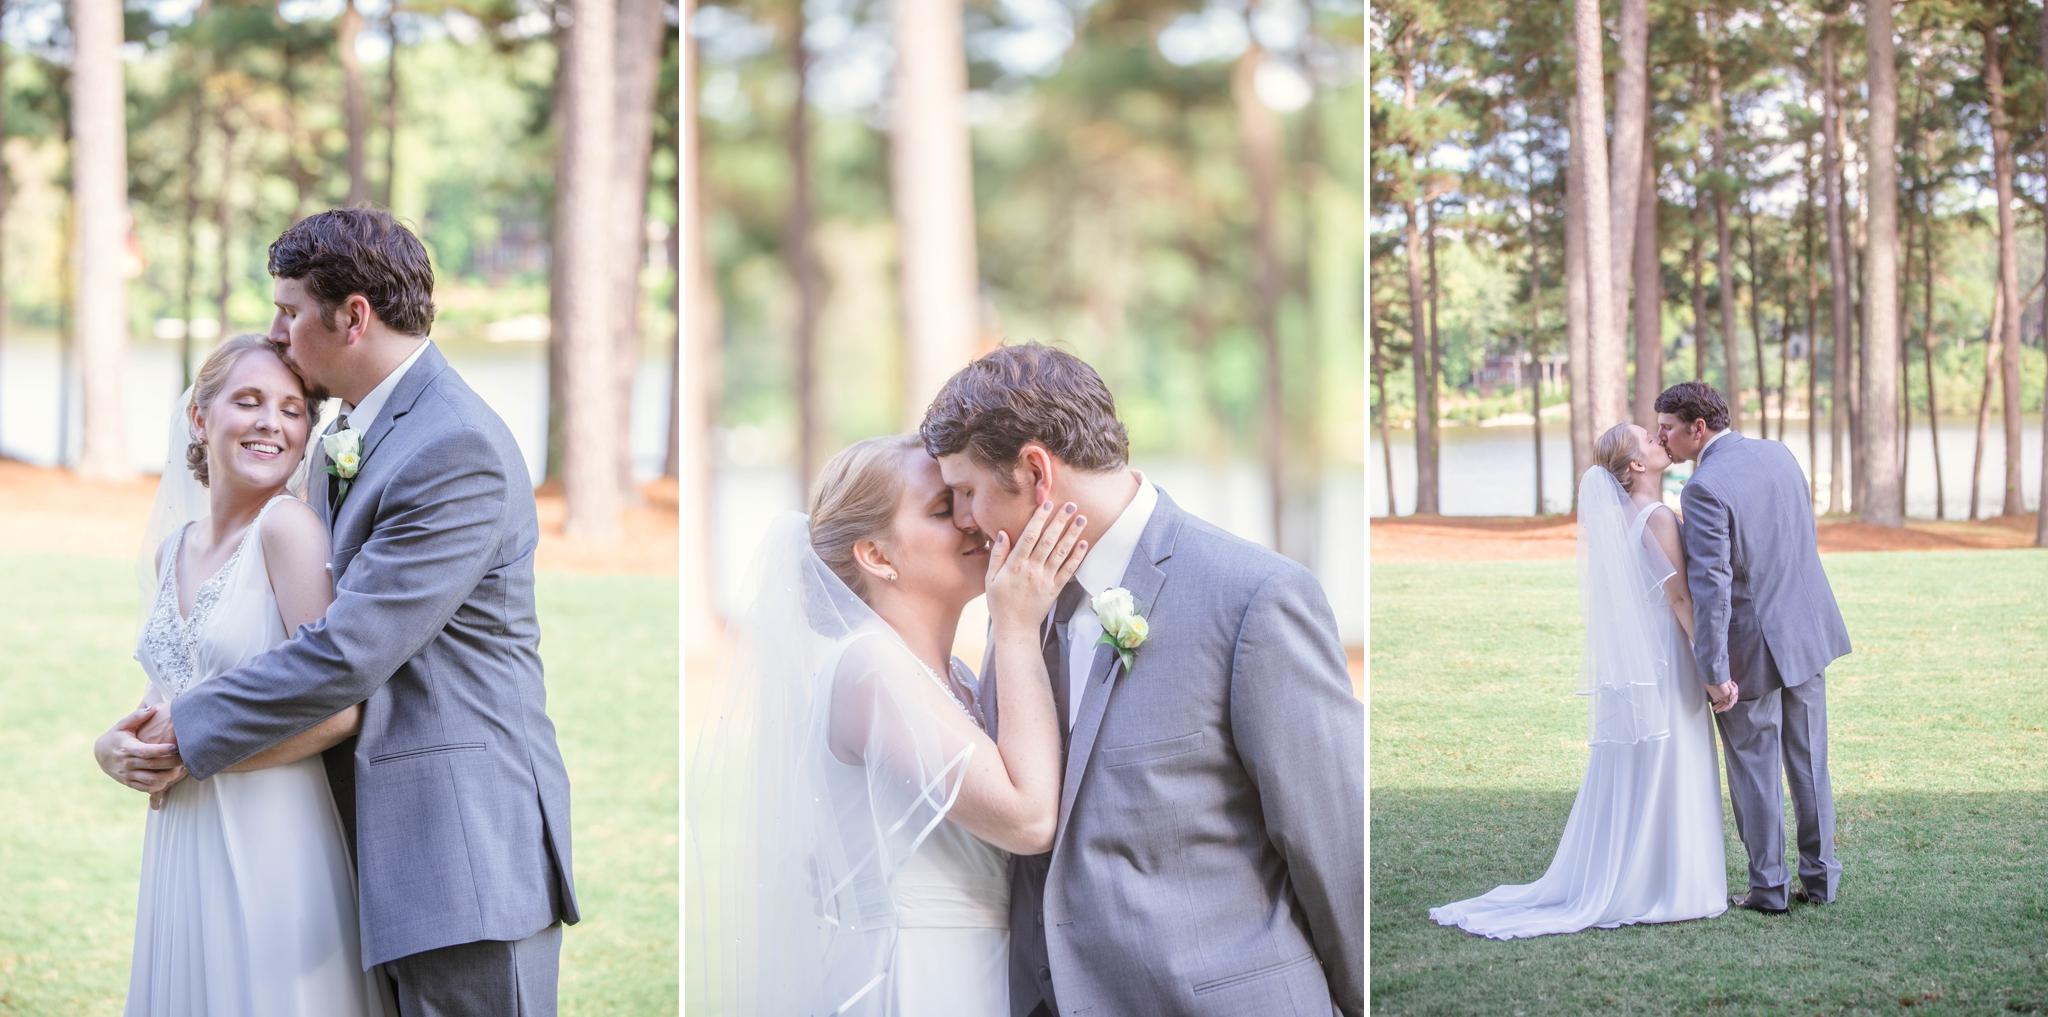 First Look between Bride and Groom - Raleigh Wedding North Carolina Photographer - Johanna Dye Photography